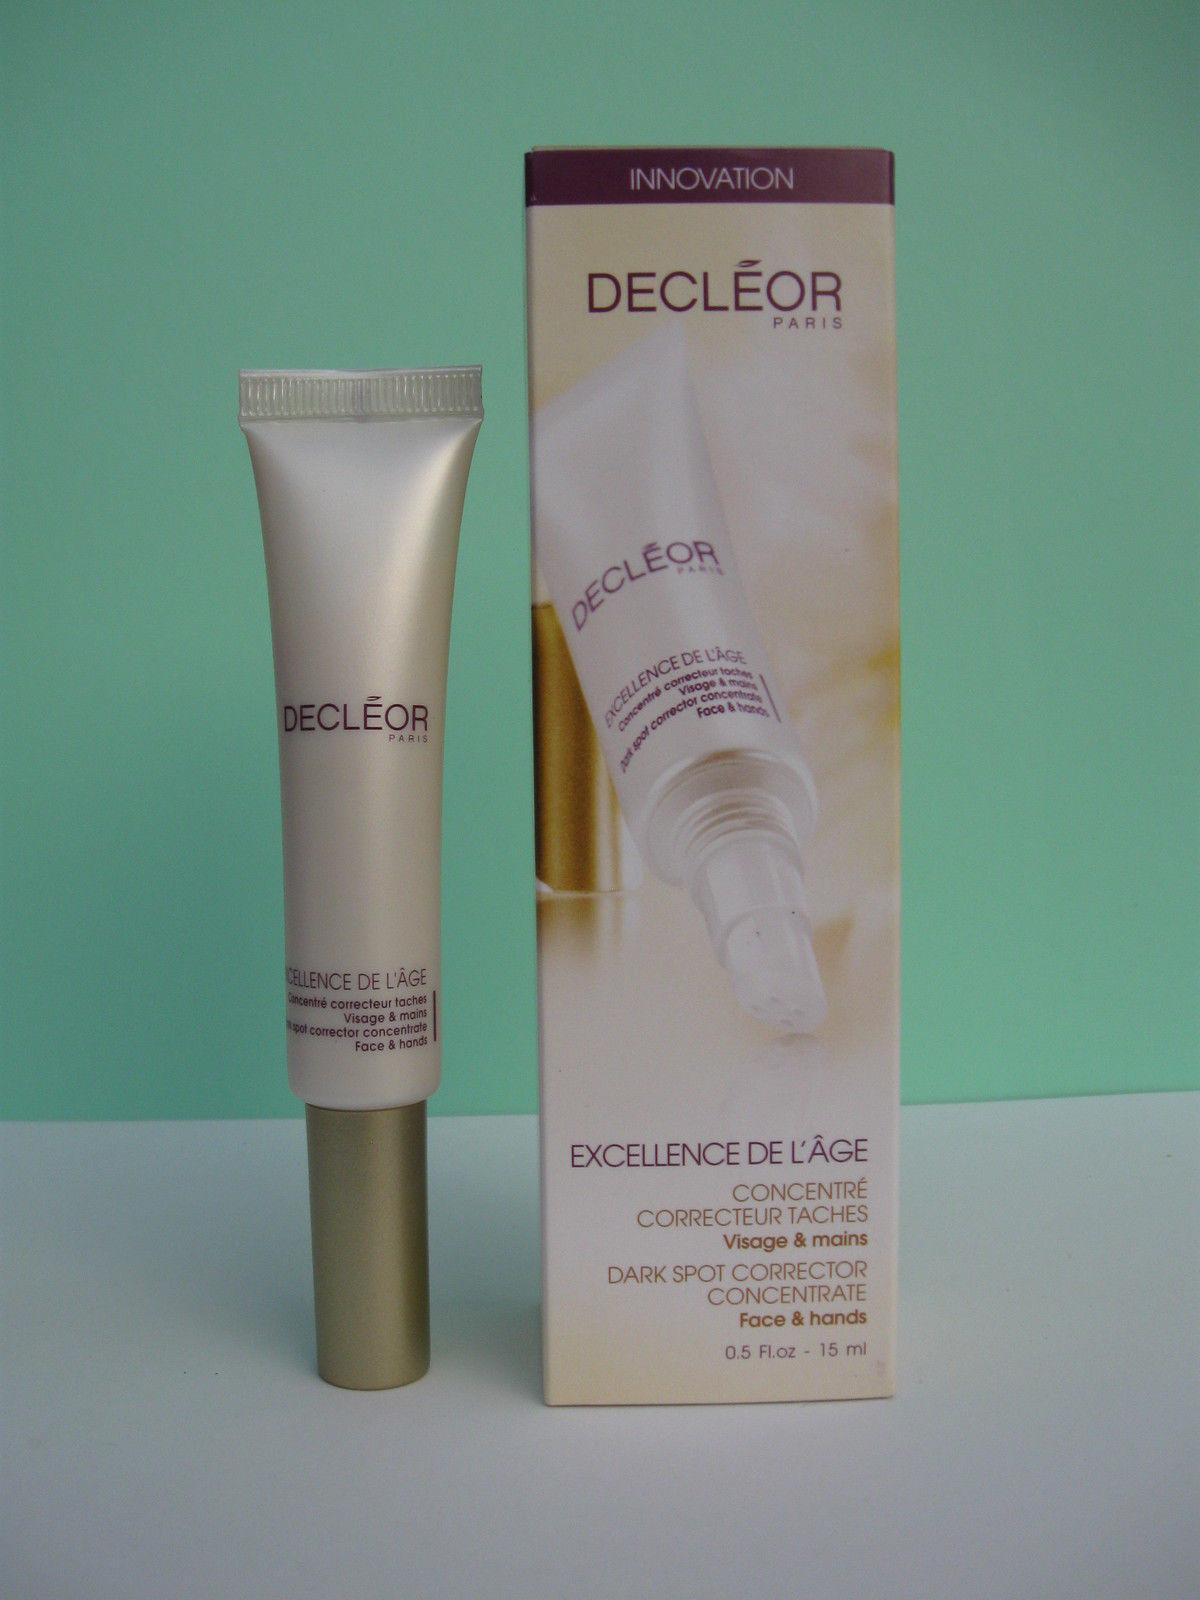 Decleor Excellence De L'Age Dark Spot Corrector Concentrate 0.5 oz / 15 ml - New - $63.53